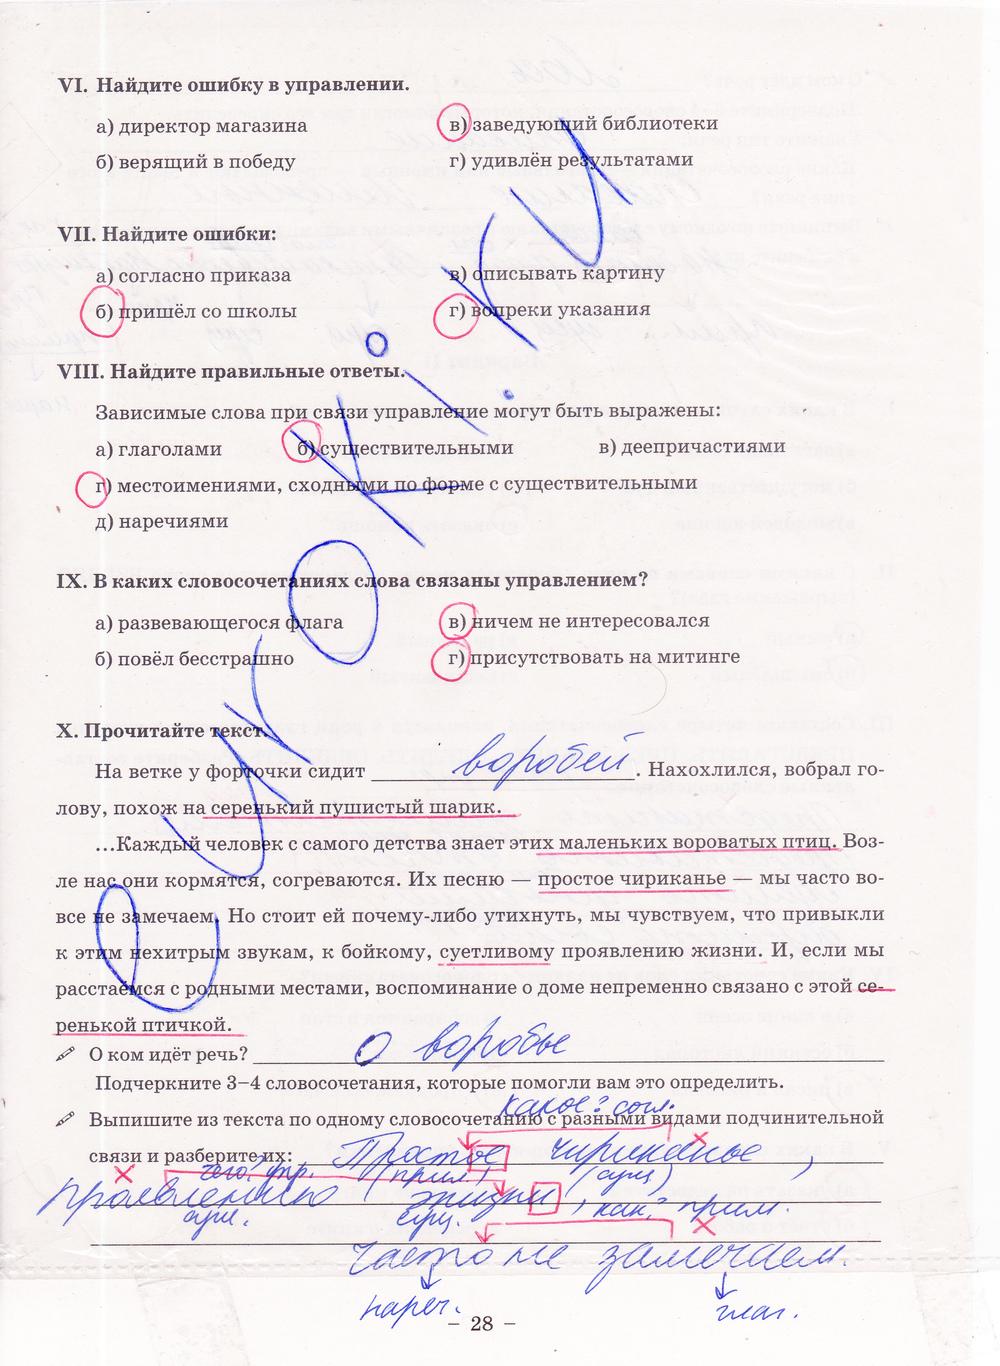 гдз русскому языку 8 класс рабочая тетрадь богданова 1 часть